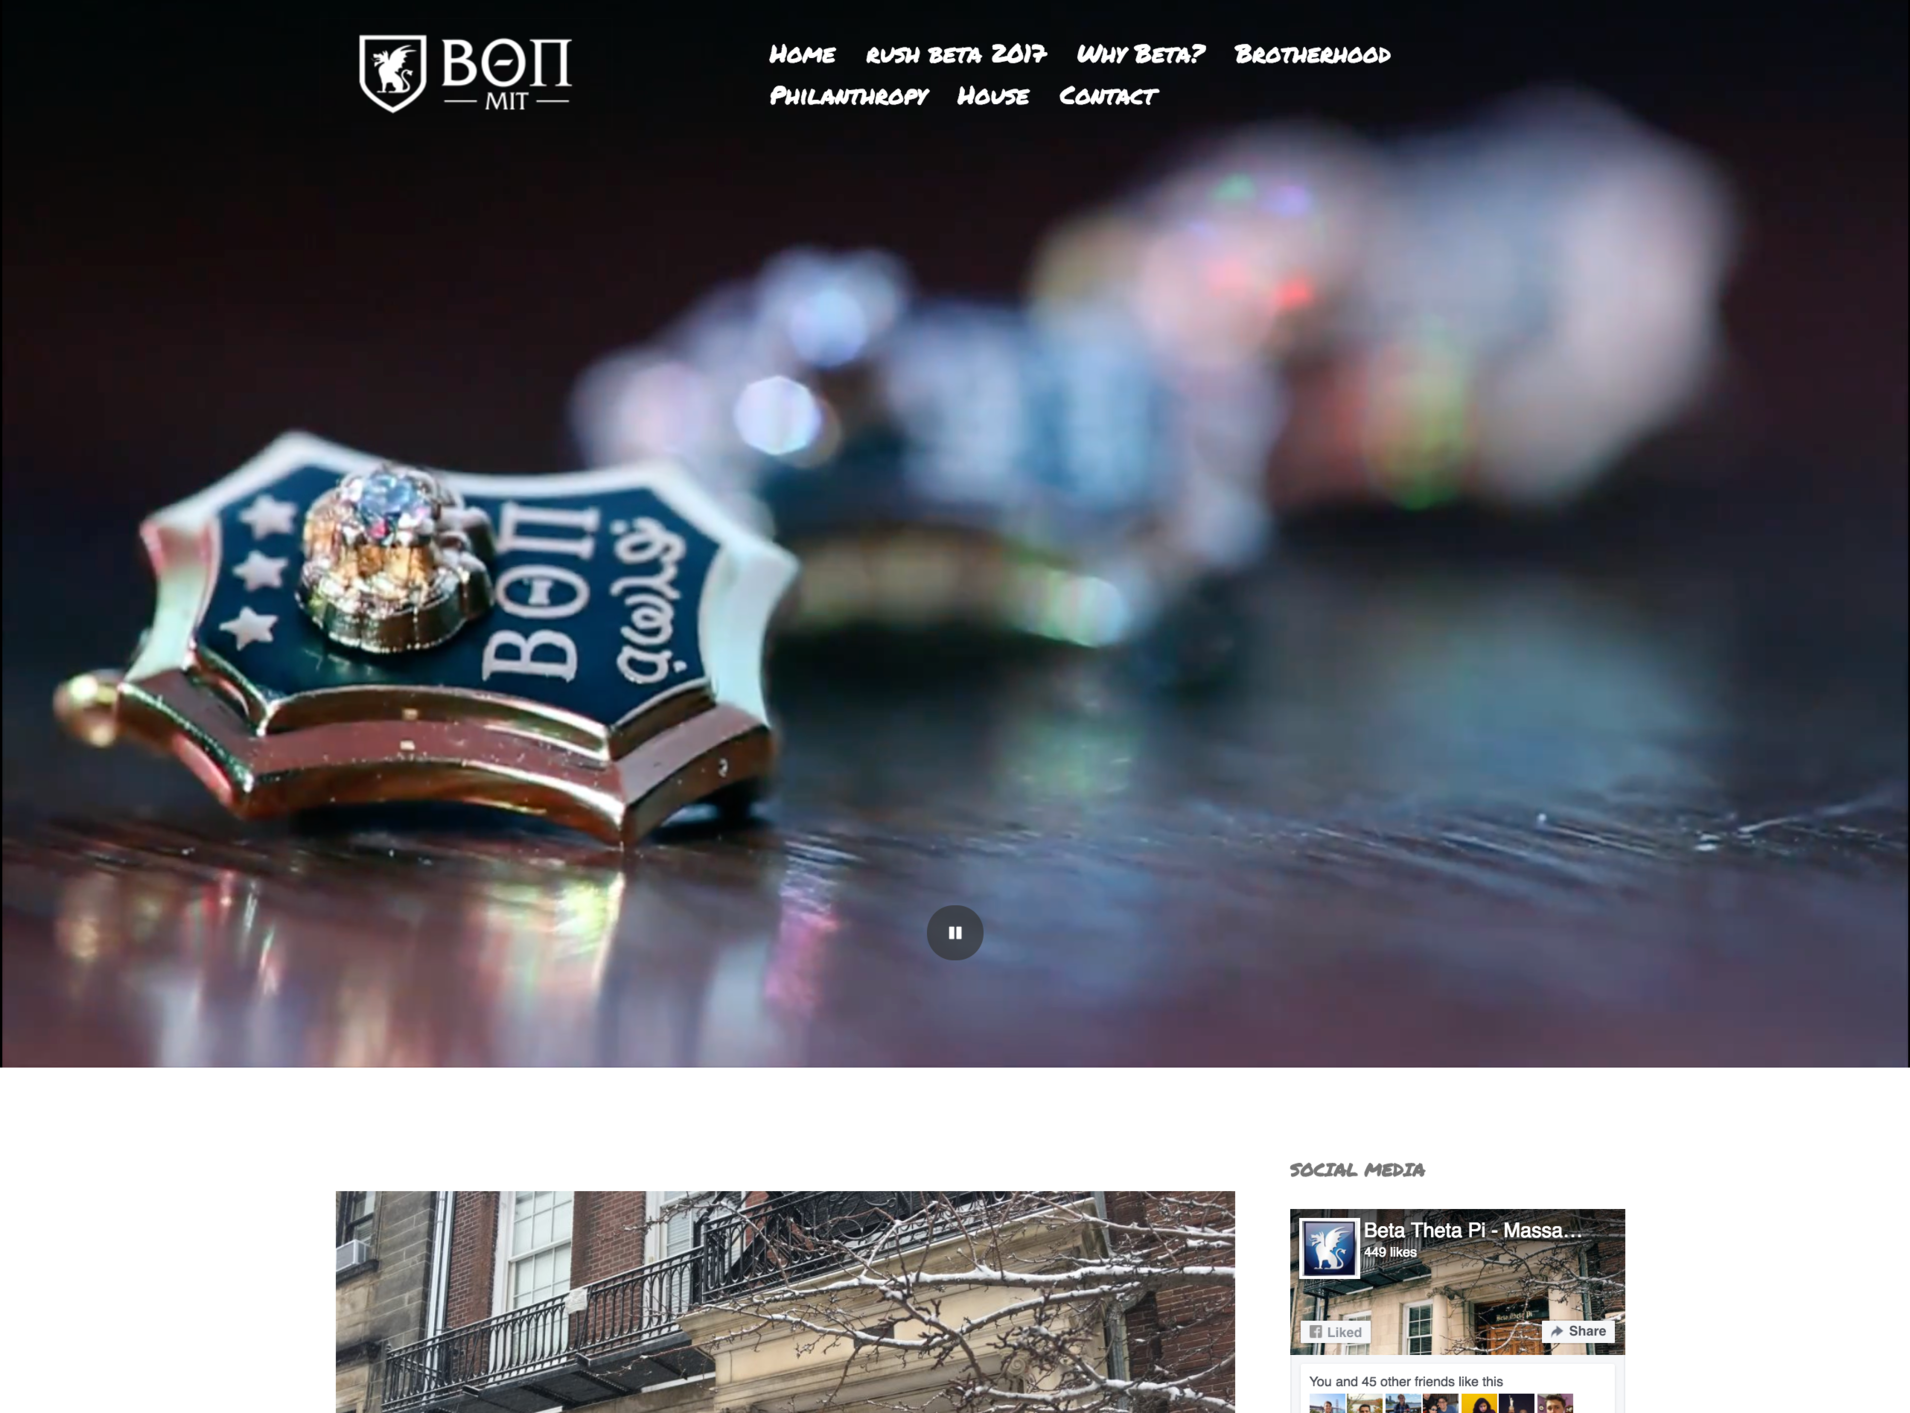 beta mit homepage.png